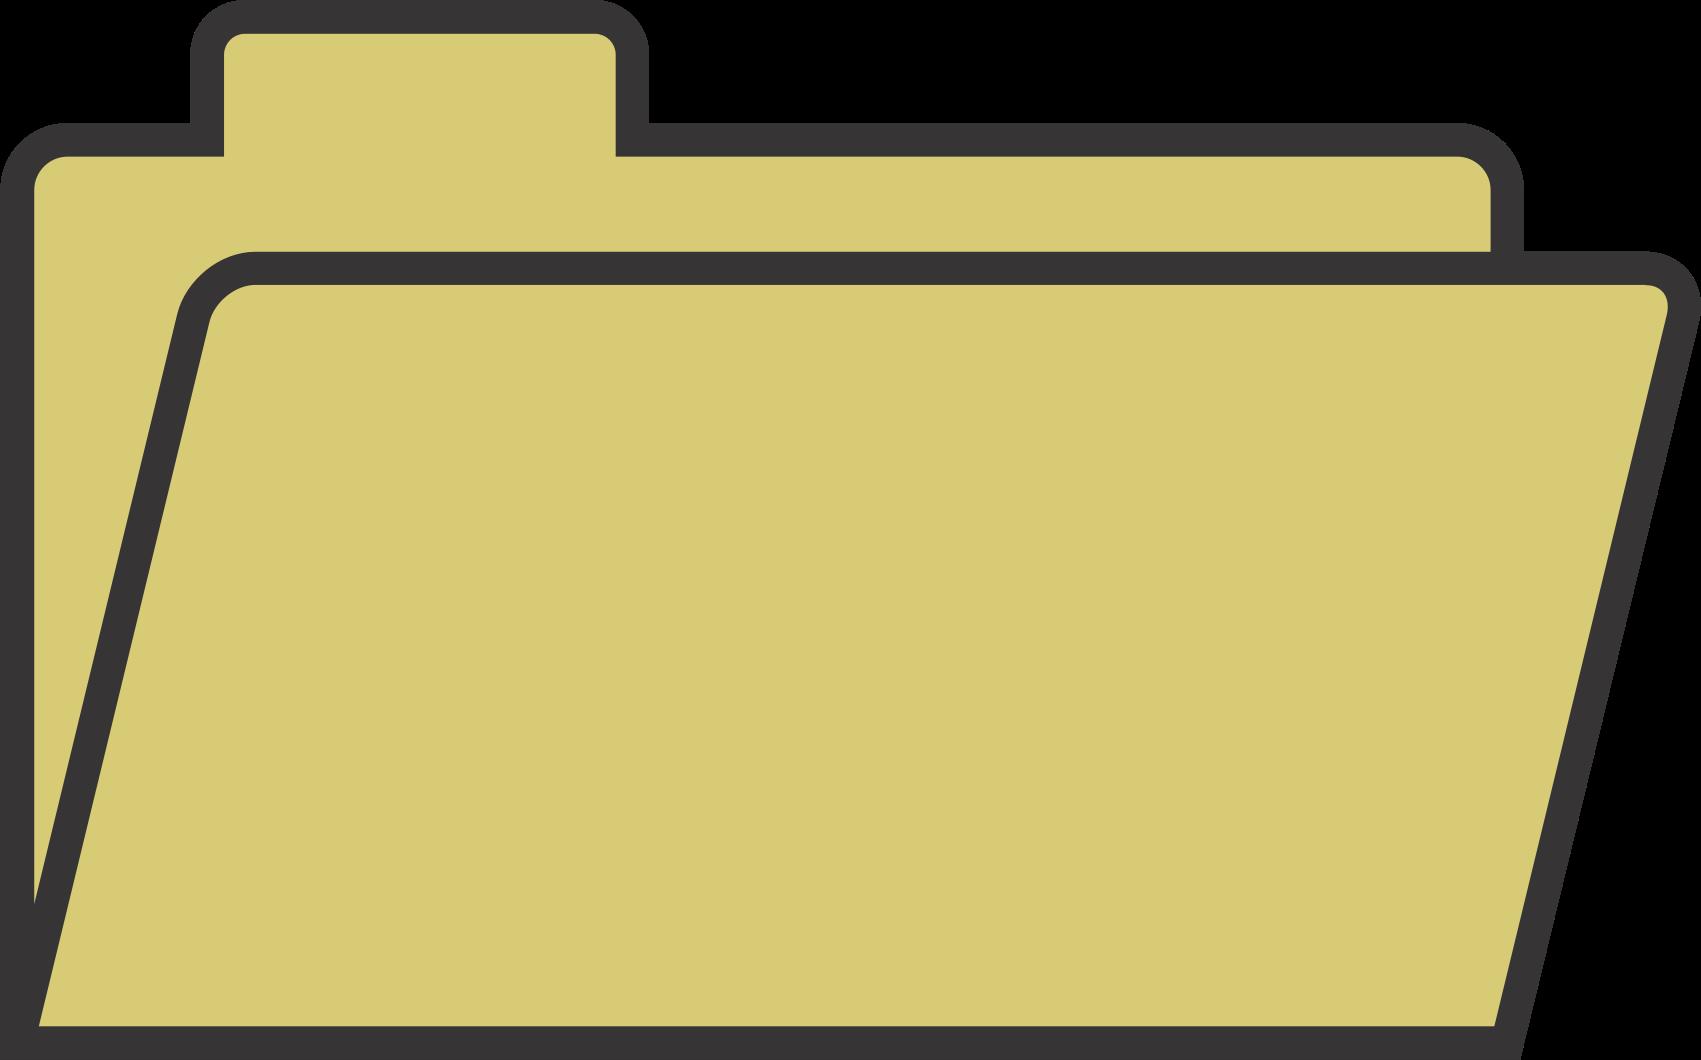 1701x1060 File Folder Open Clipart